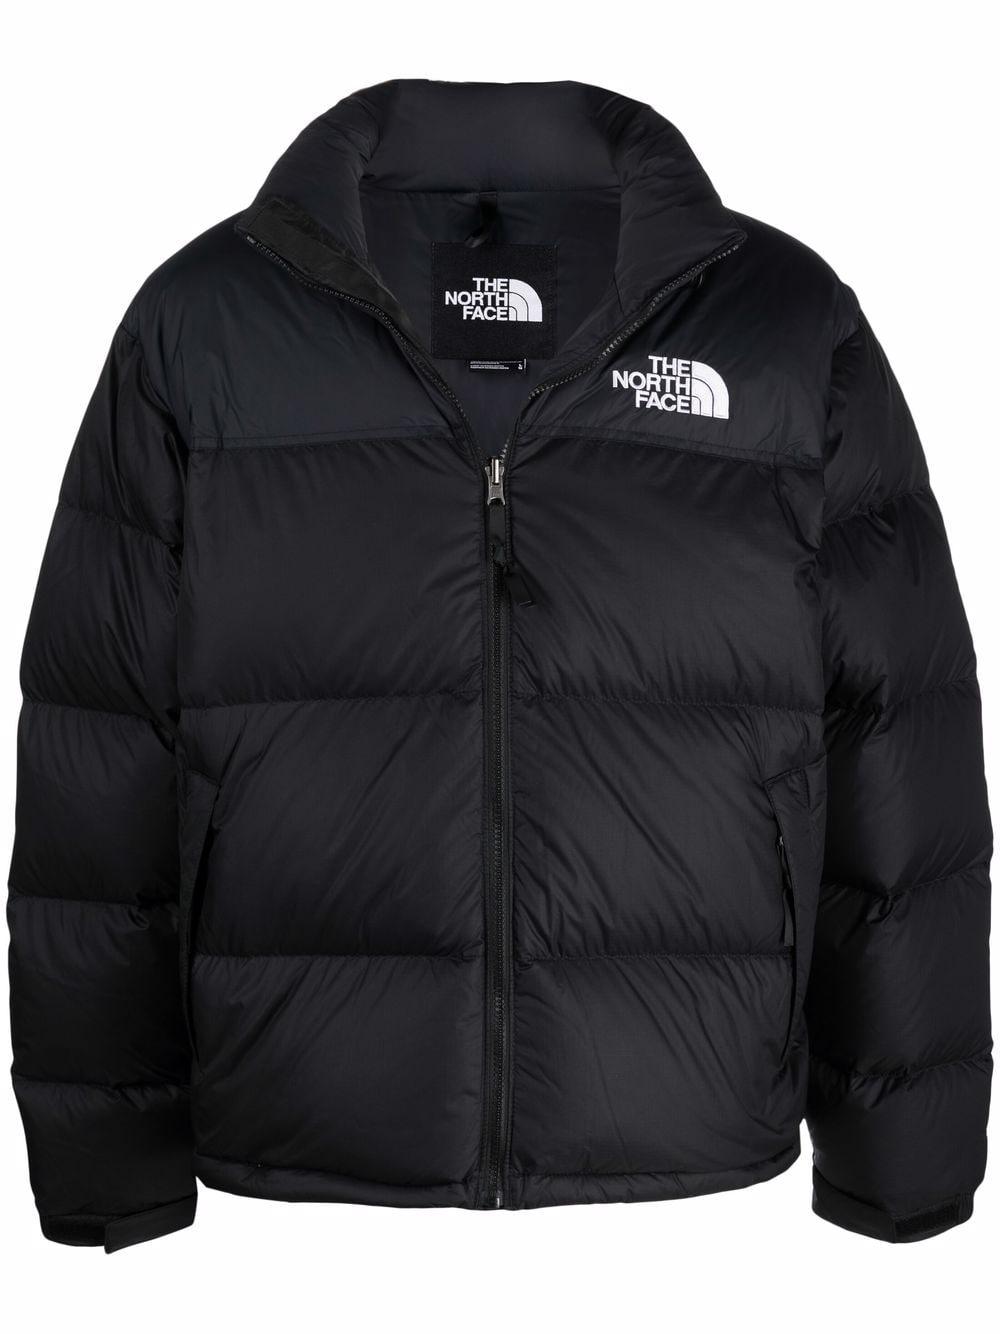 retro nuptse 1996 jacket man black THE NORTH FACE | Jackets | NF0A3C8DLE41